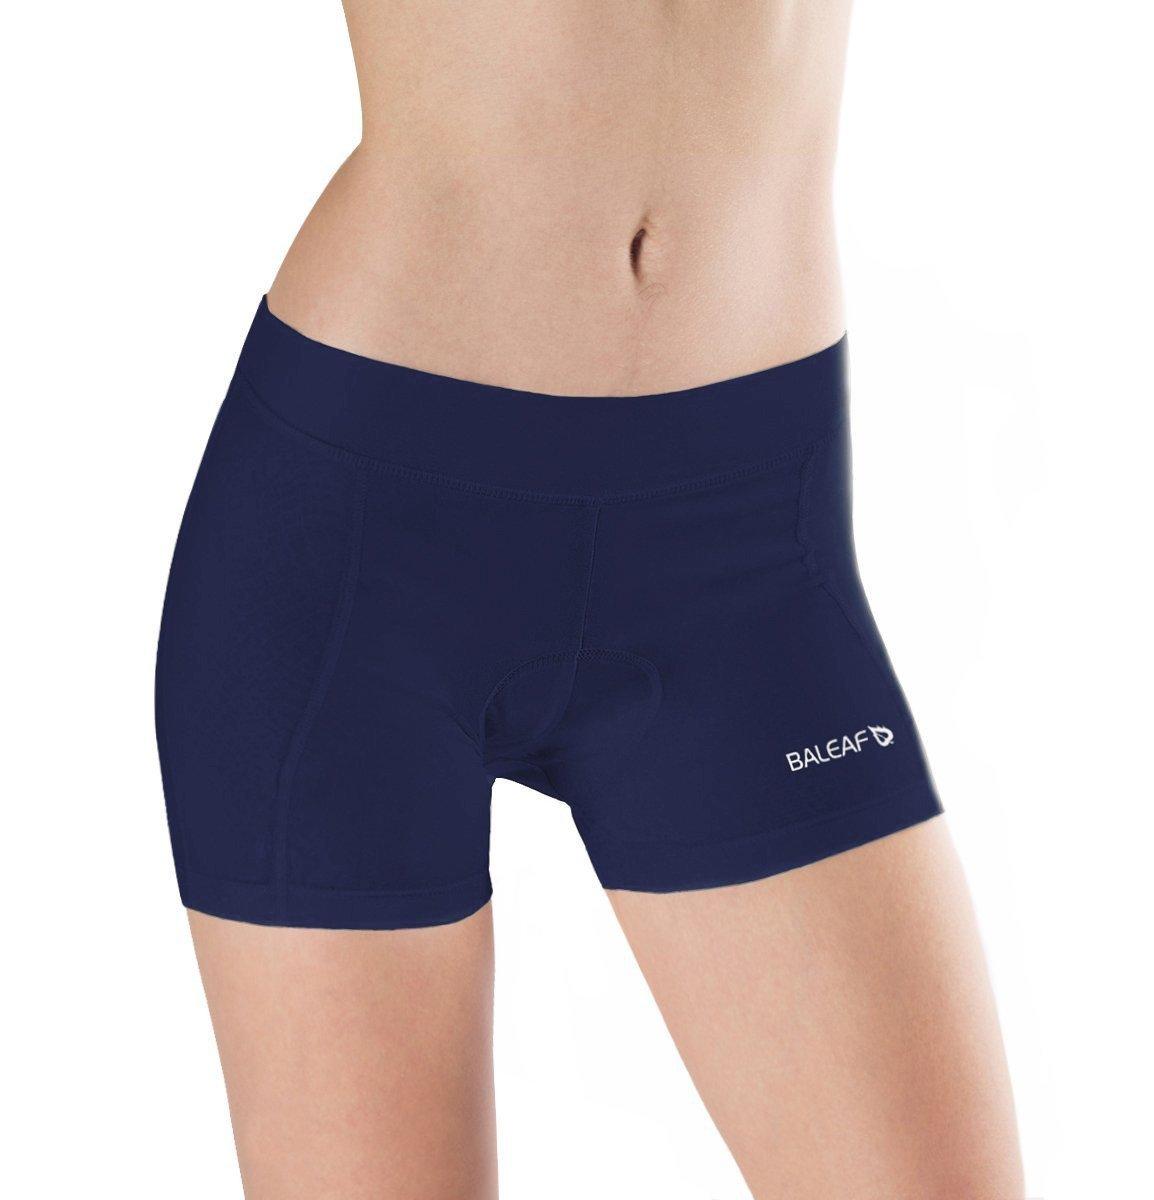 Baleaf Women's 3D Padded Cycling Brief Underwear Shorts